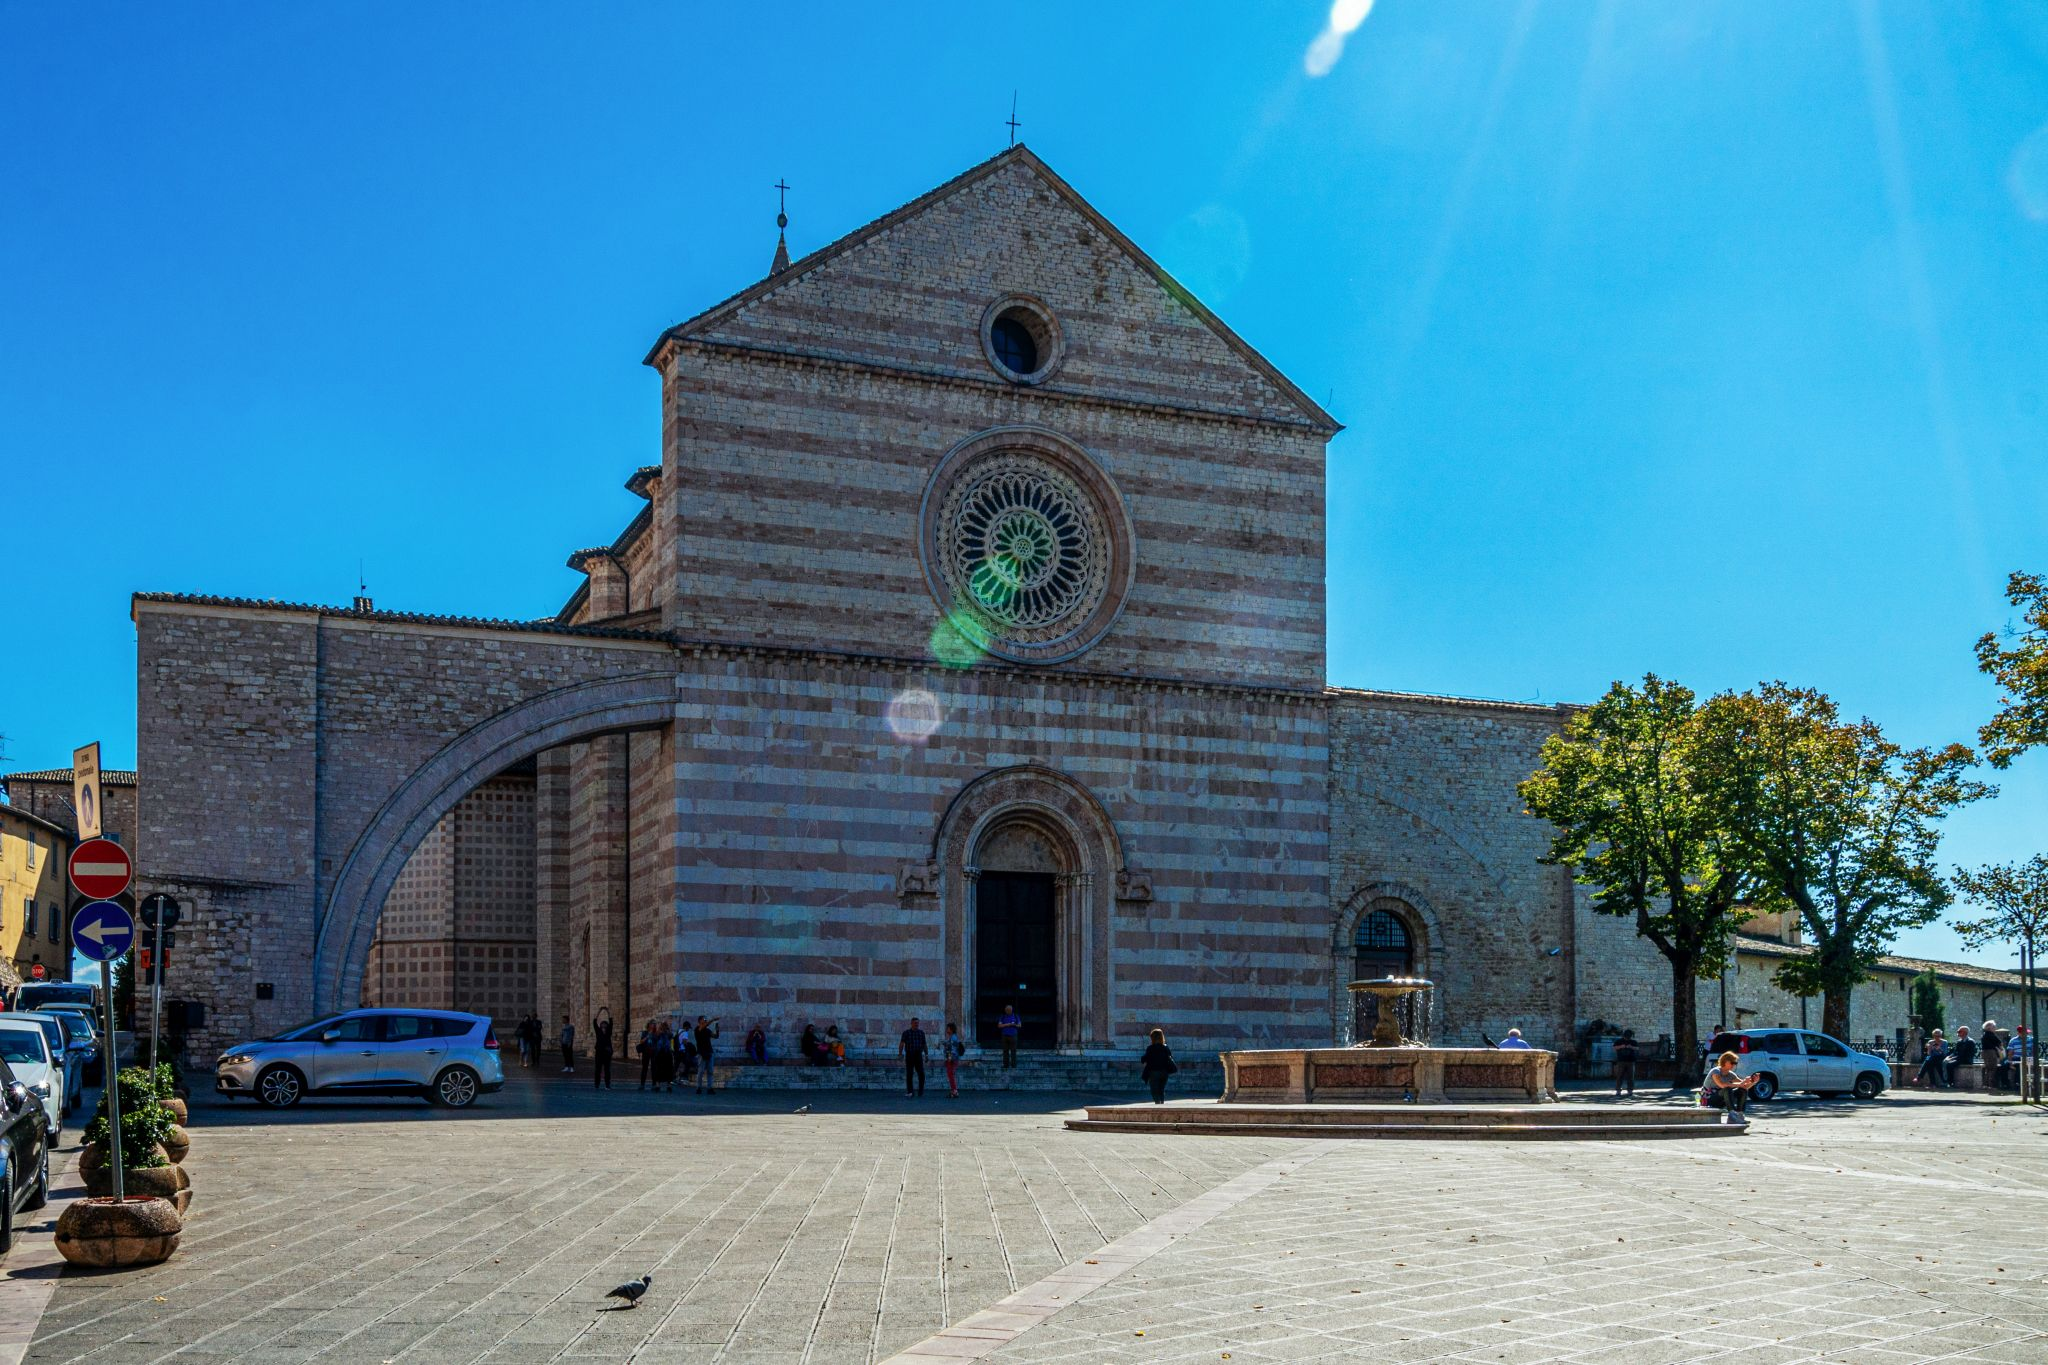 Basilica di Sanata Chiara, Assisi, Italy